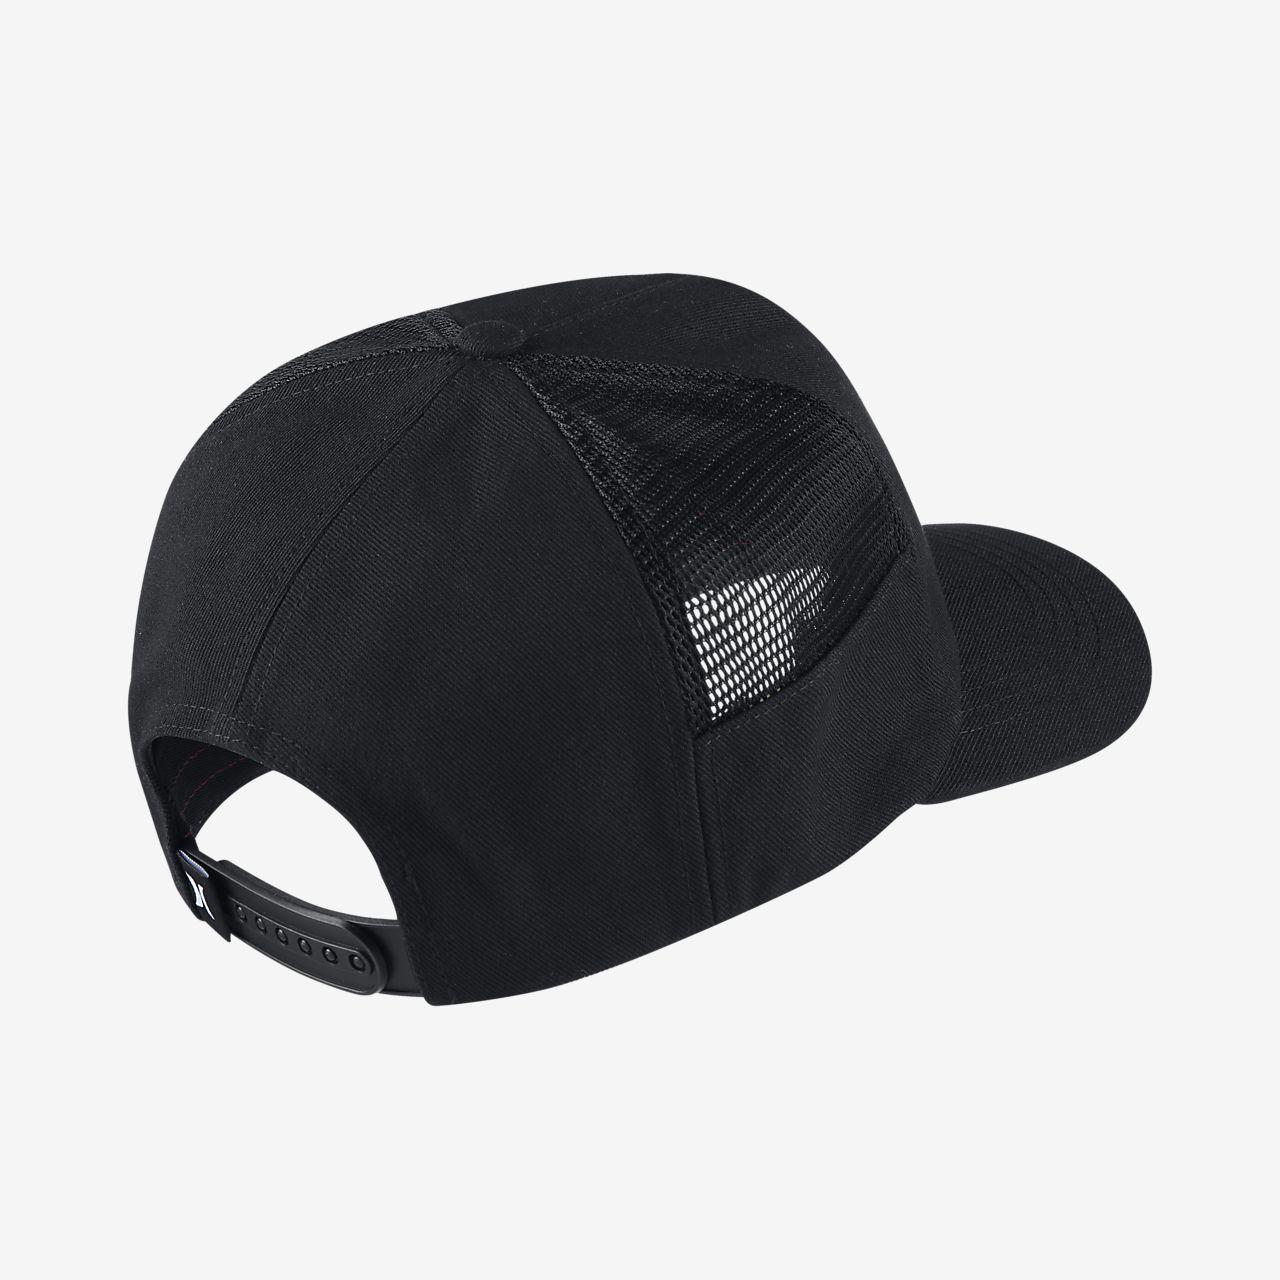 43c77d4c080b7 Hurley Jacare Dri-FIT Unisex Adjustable Hat. Nike.com NZ